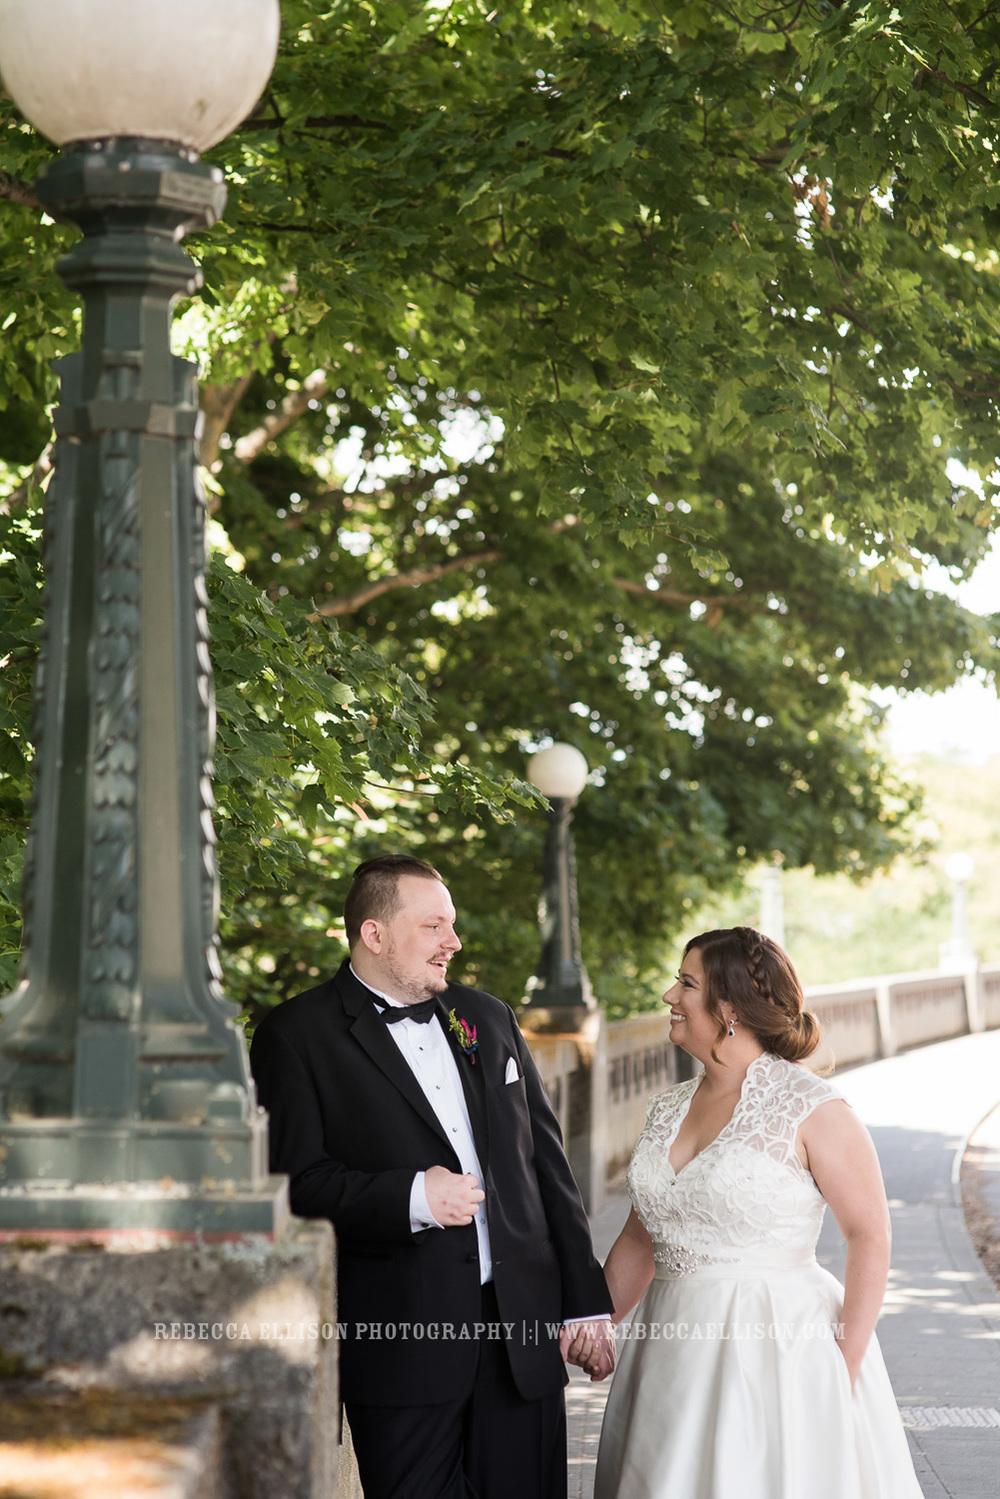 St-Annes-Church-Wedding-Queen-Anne-Hill-Seattle-0026.jpg